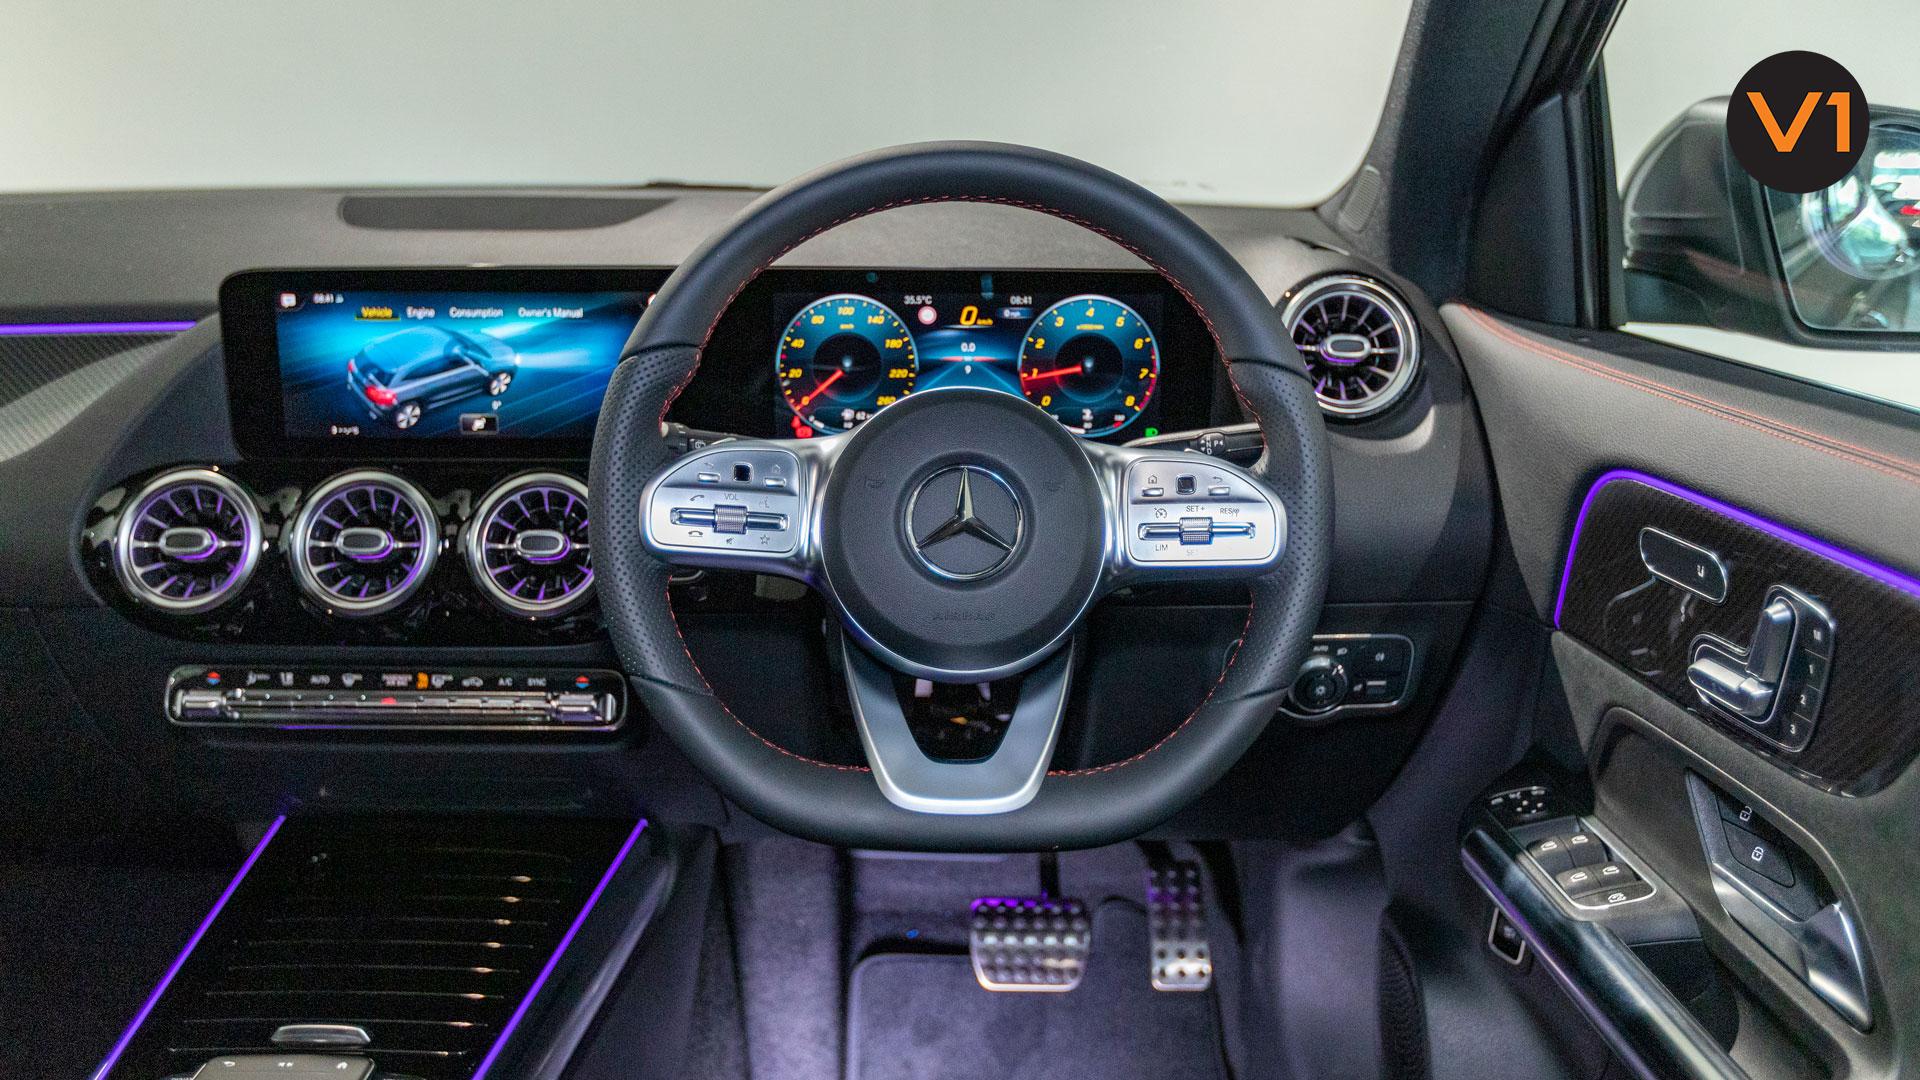 Mercedes-Benz GLA200 AMG Premium Plus - Steering Wheel